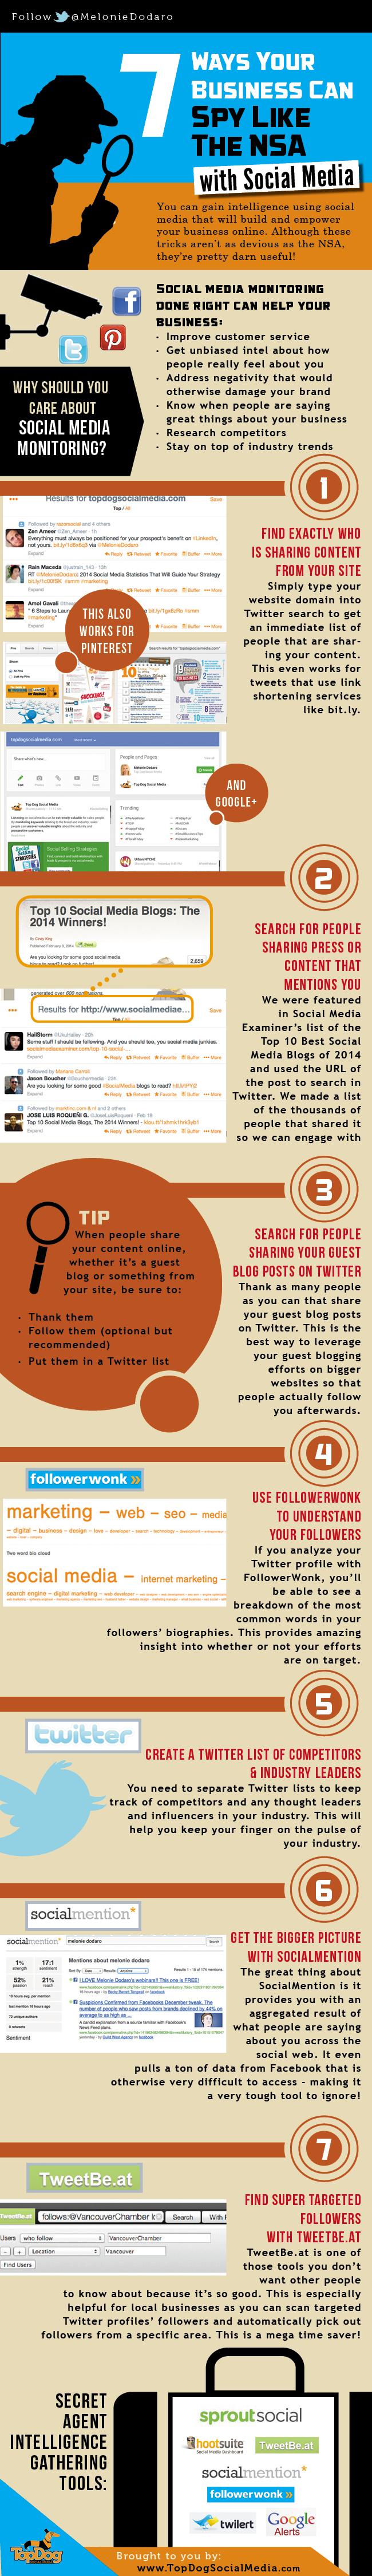 7 Ways To Use Social Media Monitoring Like A Pro.jpg